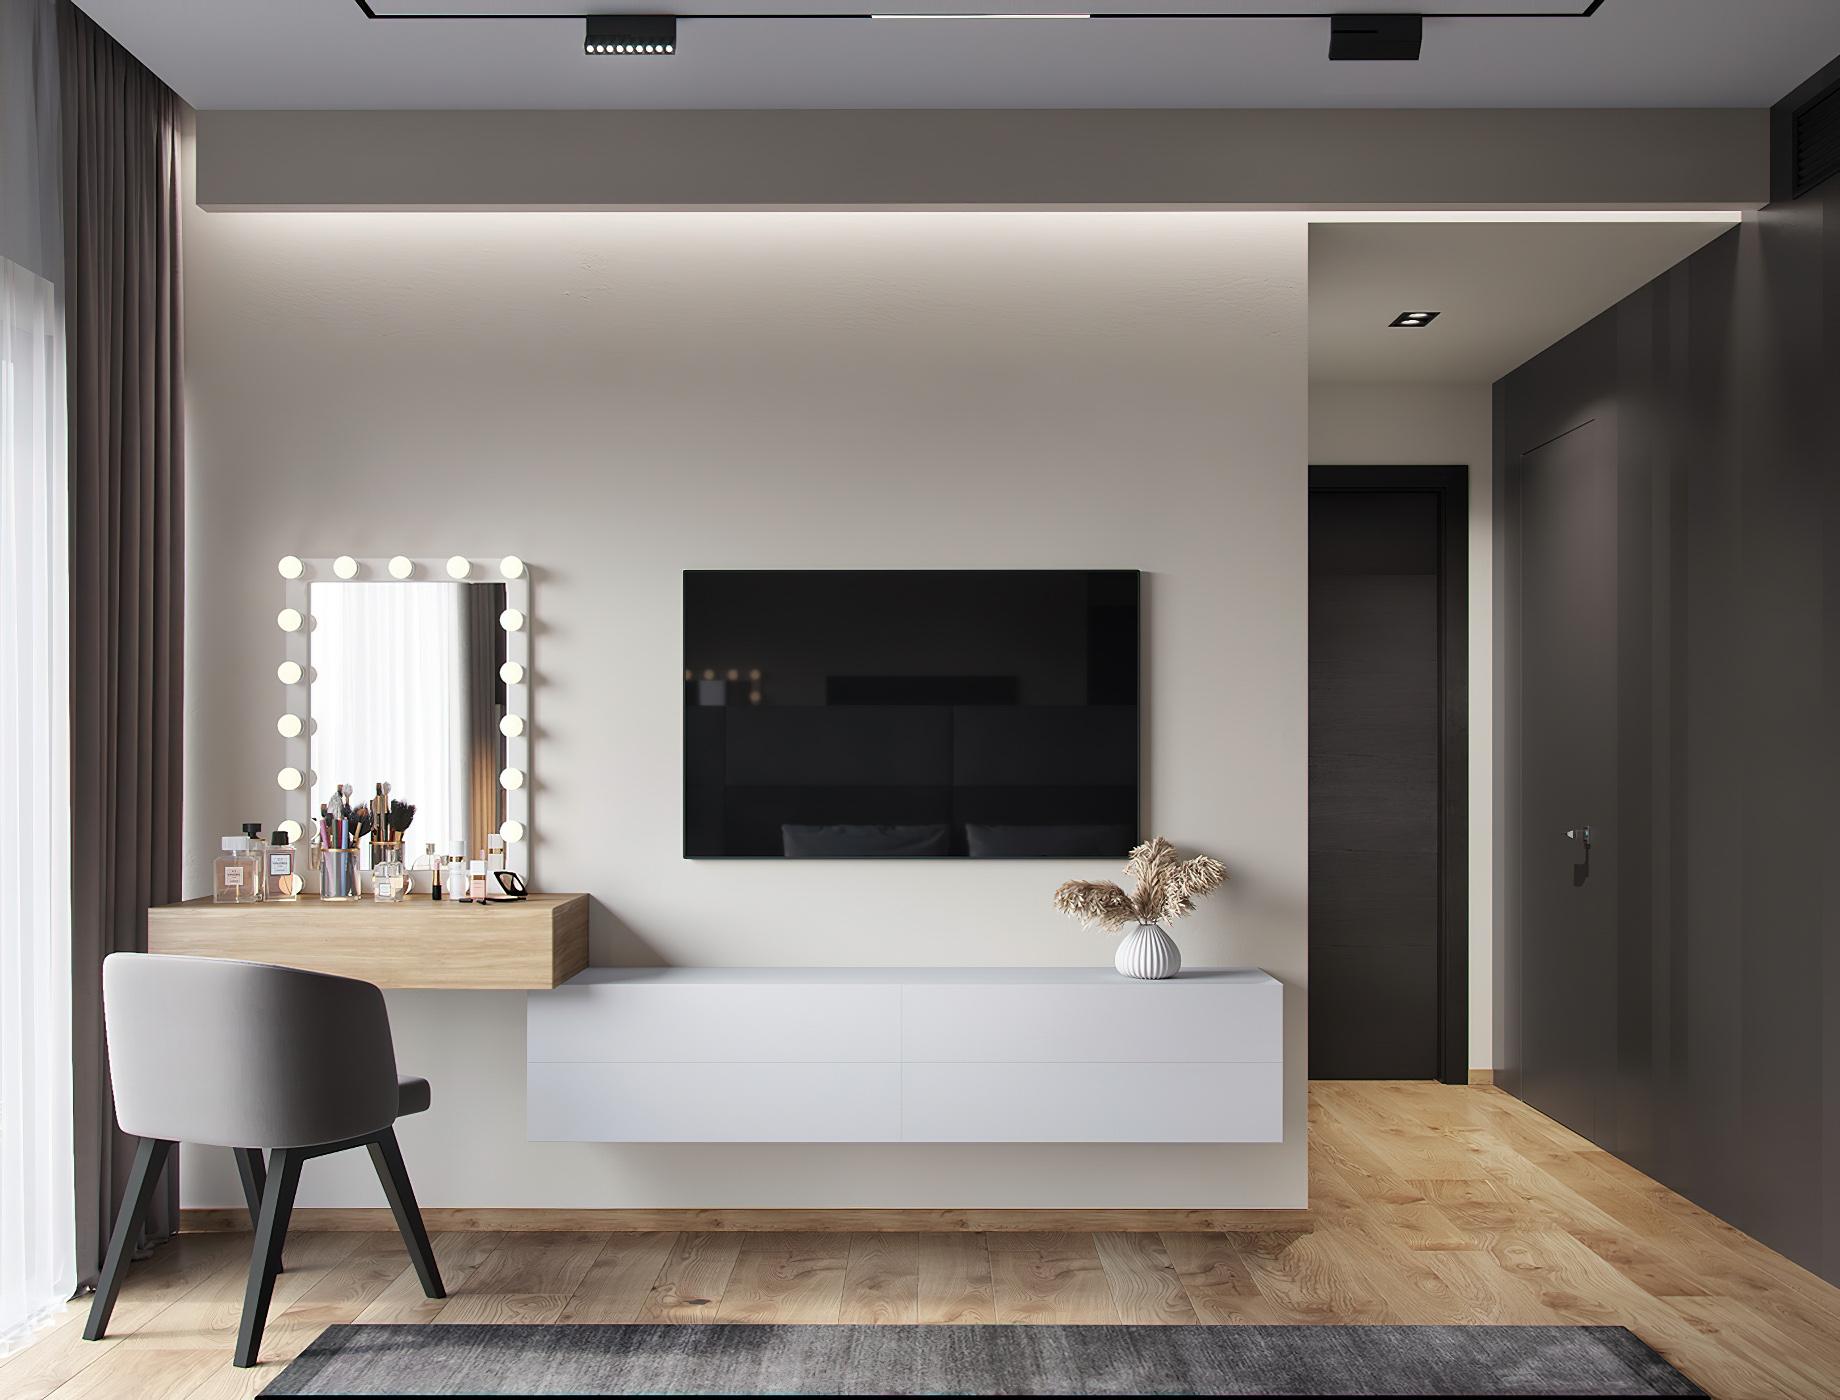 House JK Park Rublevo Interior Design Moscow, Russia – Strong Design